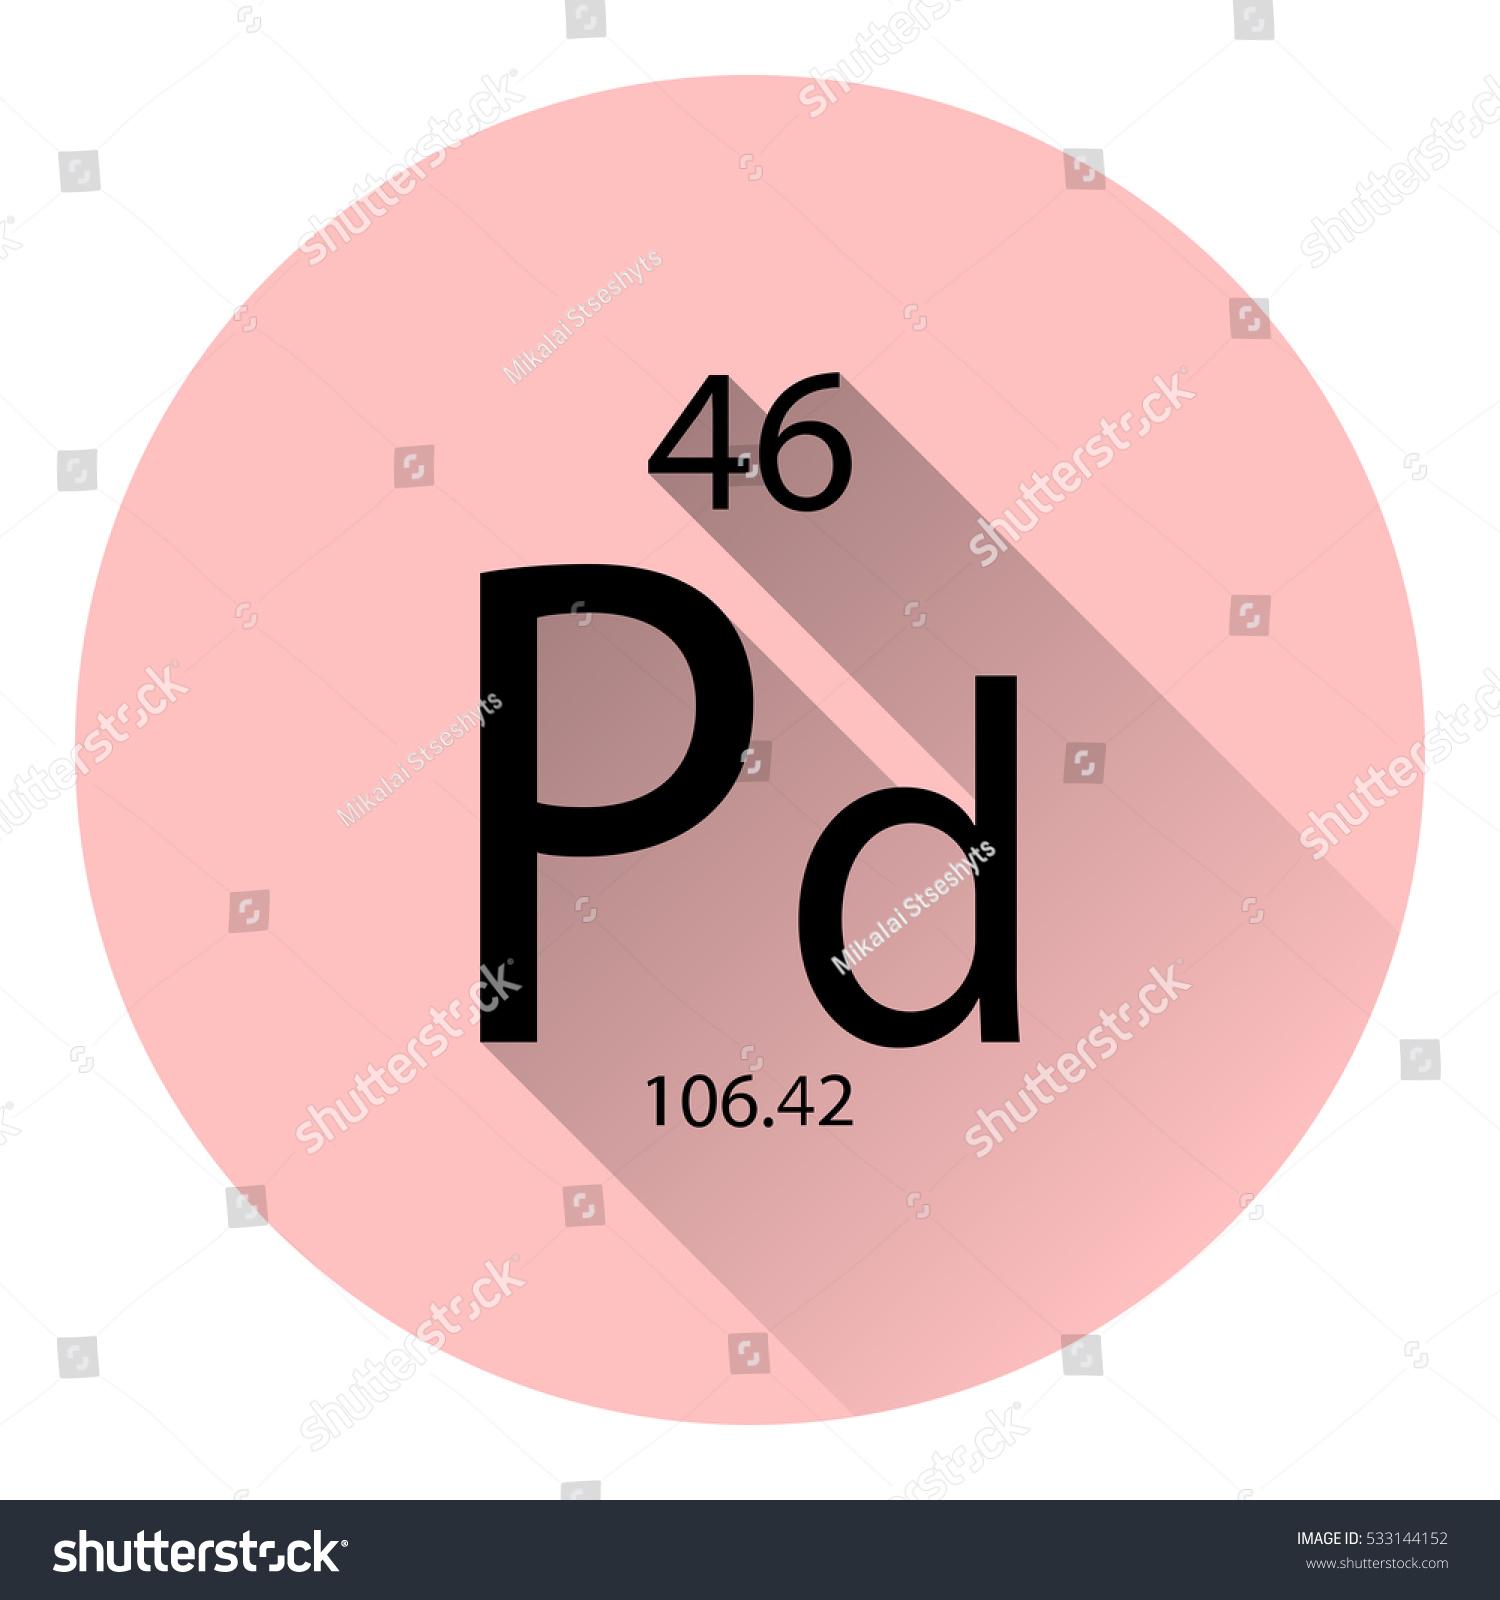 Periodic table element palladium basic properties stock vector the periodic table element palladium with the basic properties flat style with long shadow gamestrikefo Gallery